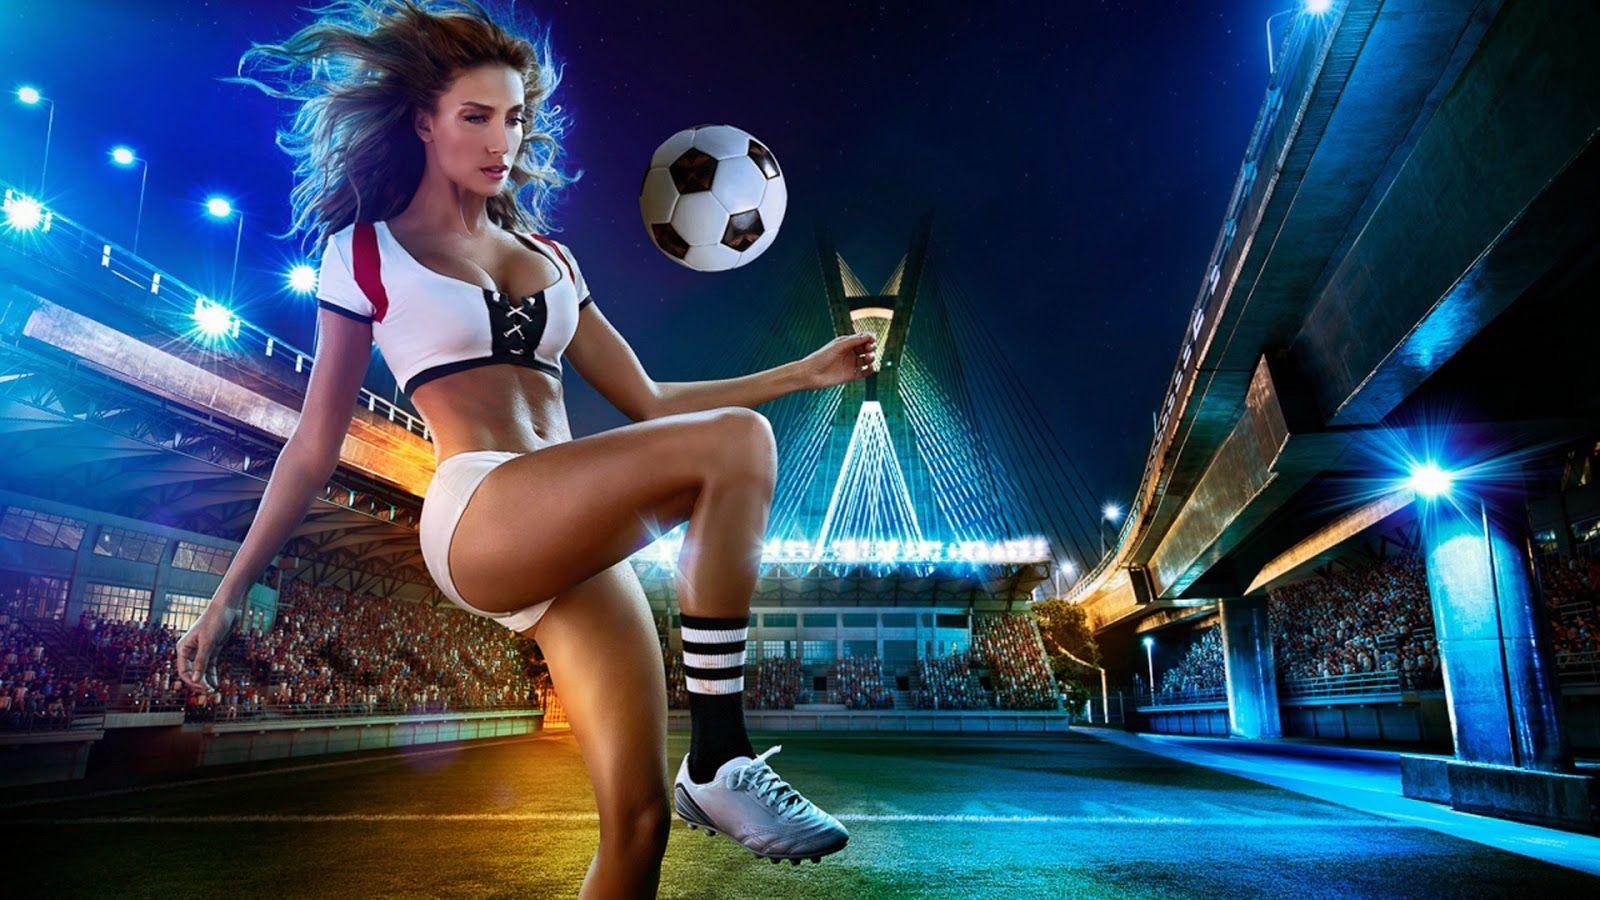 football picture hd: Sport Football Girl Wallpaper